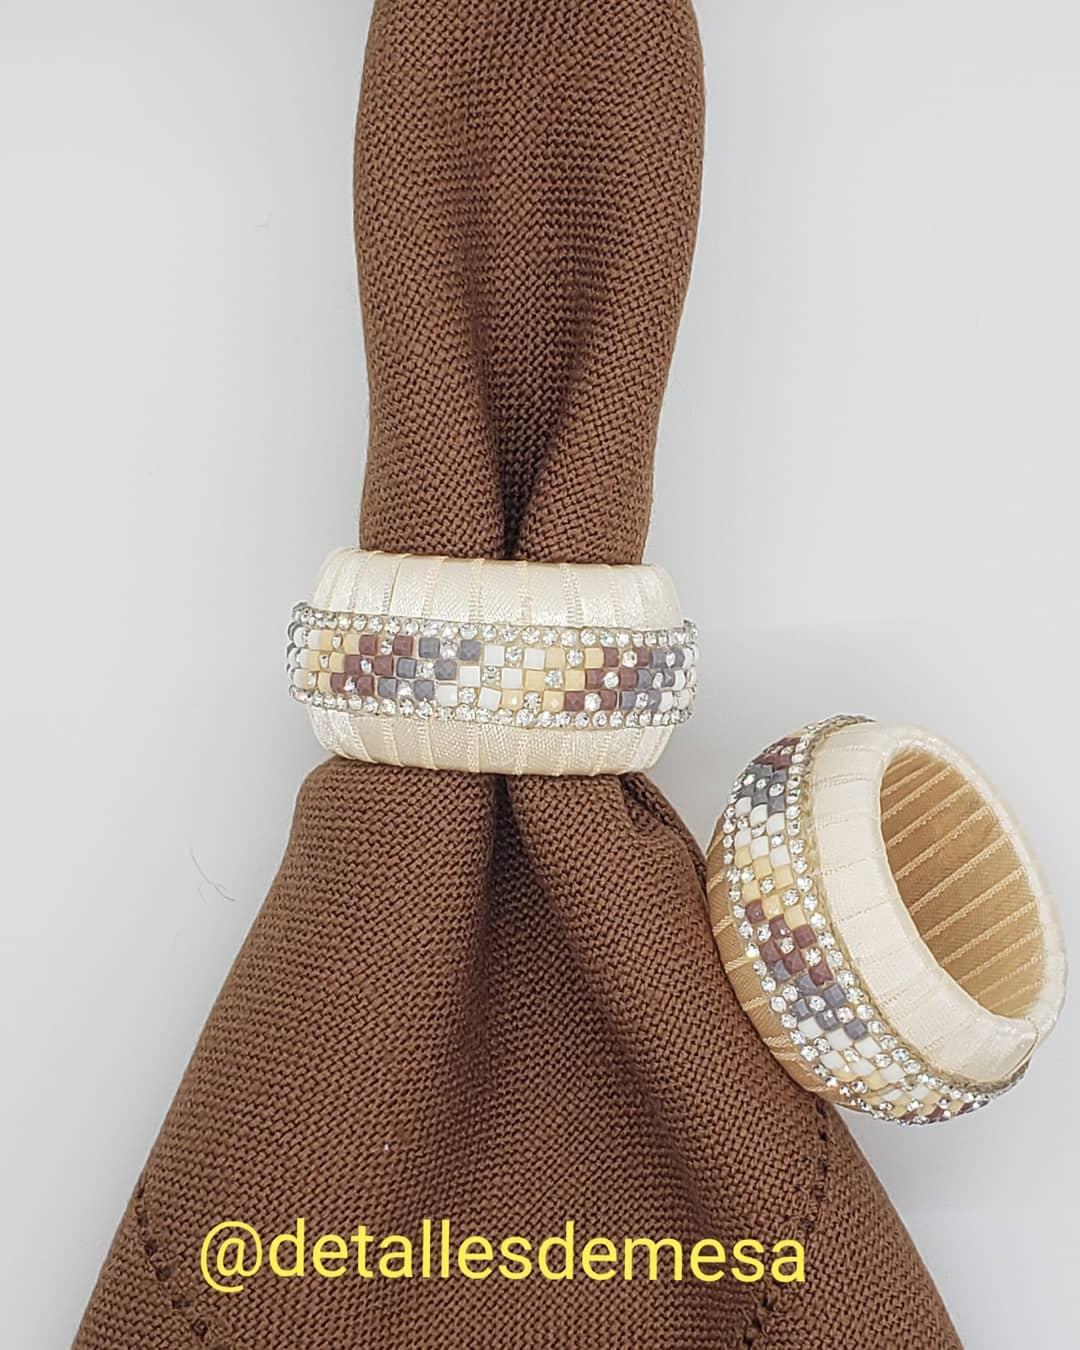 Porta-guardanapos moderno e elegante para a sua mesa. Escreva para nós ... #portaservilleta ...